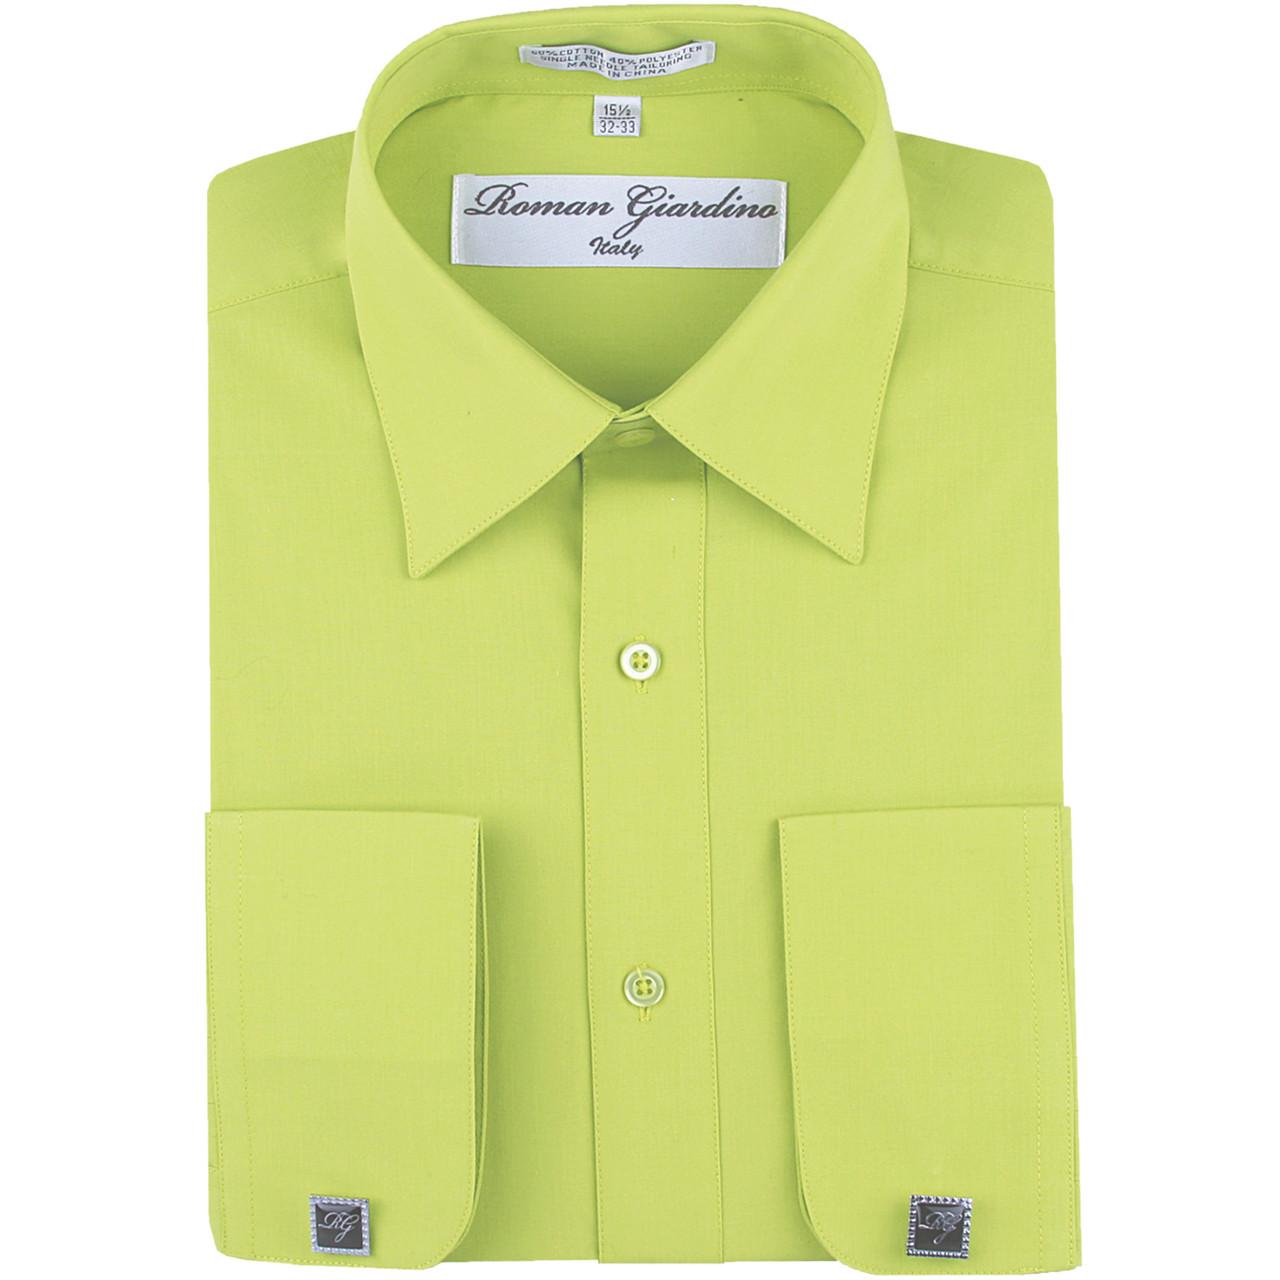 Roman Giardino Mens Cotton Dress Shirt Only 26 Light Gray